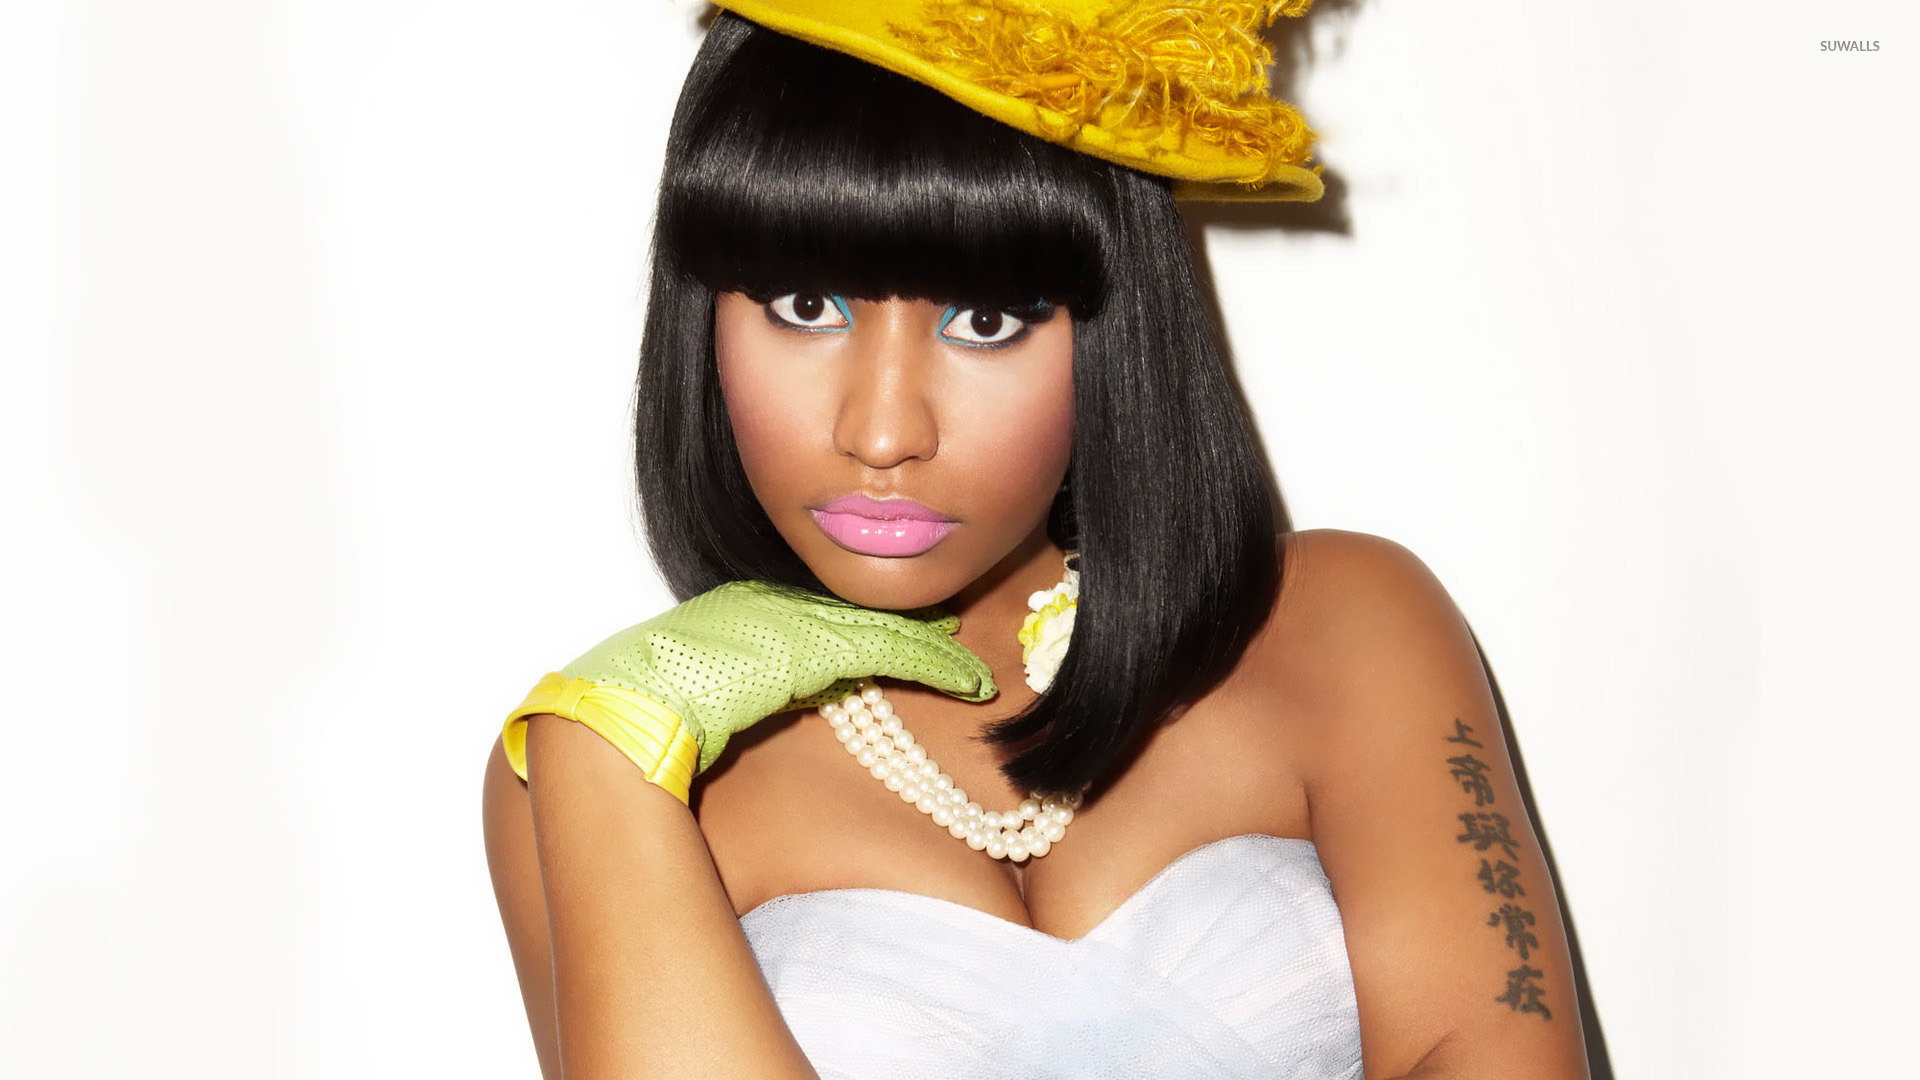 Nicki Minaj 12 Wallpaper Celebrity Wallpapers 27892